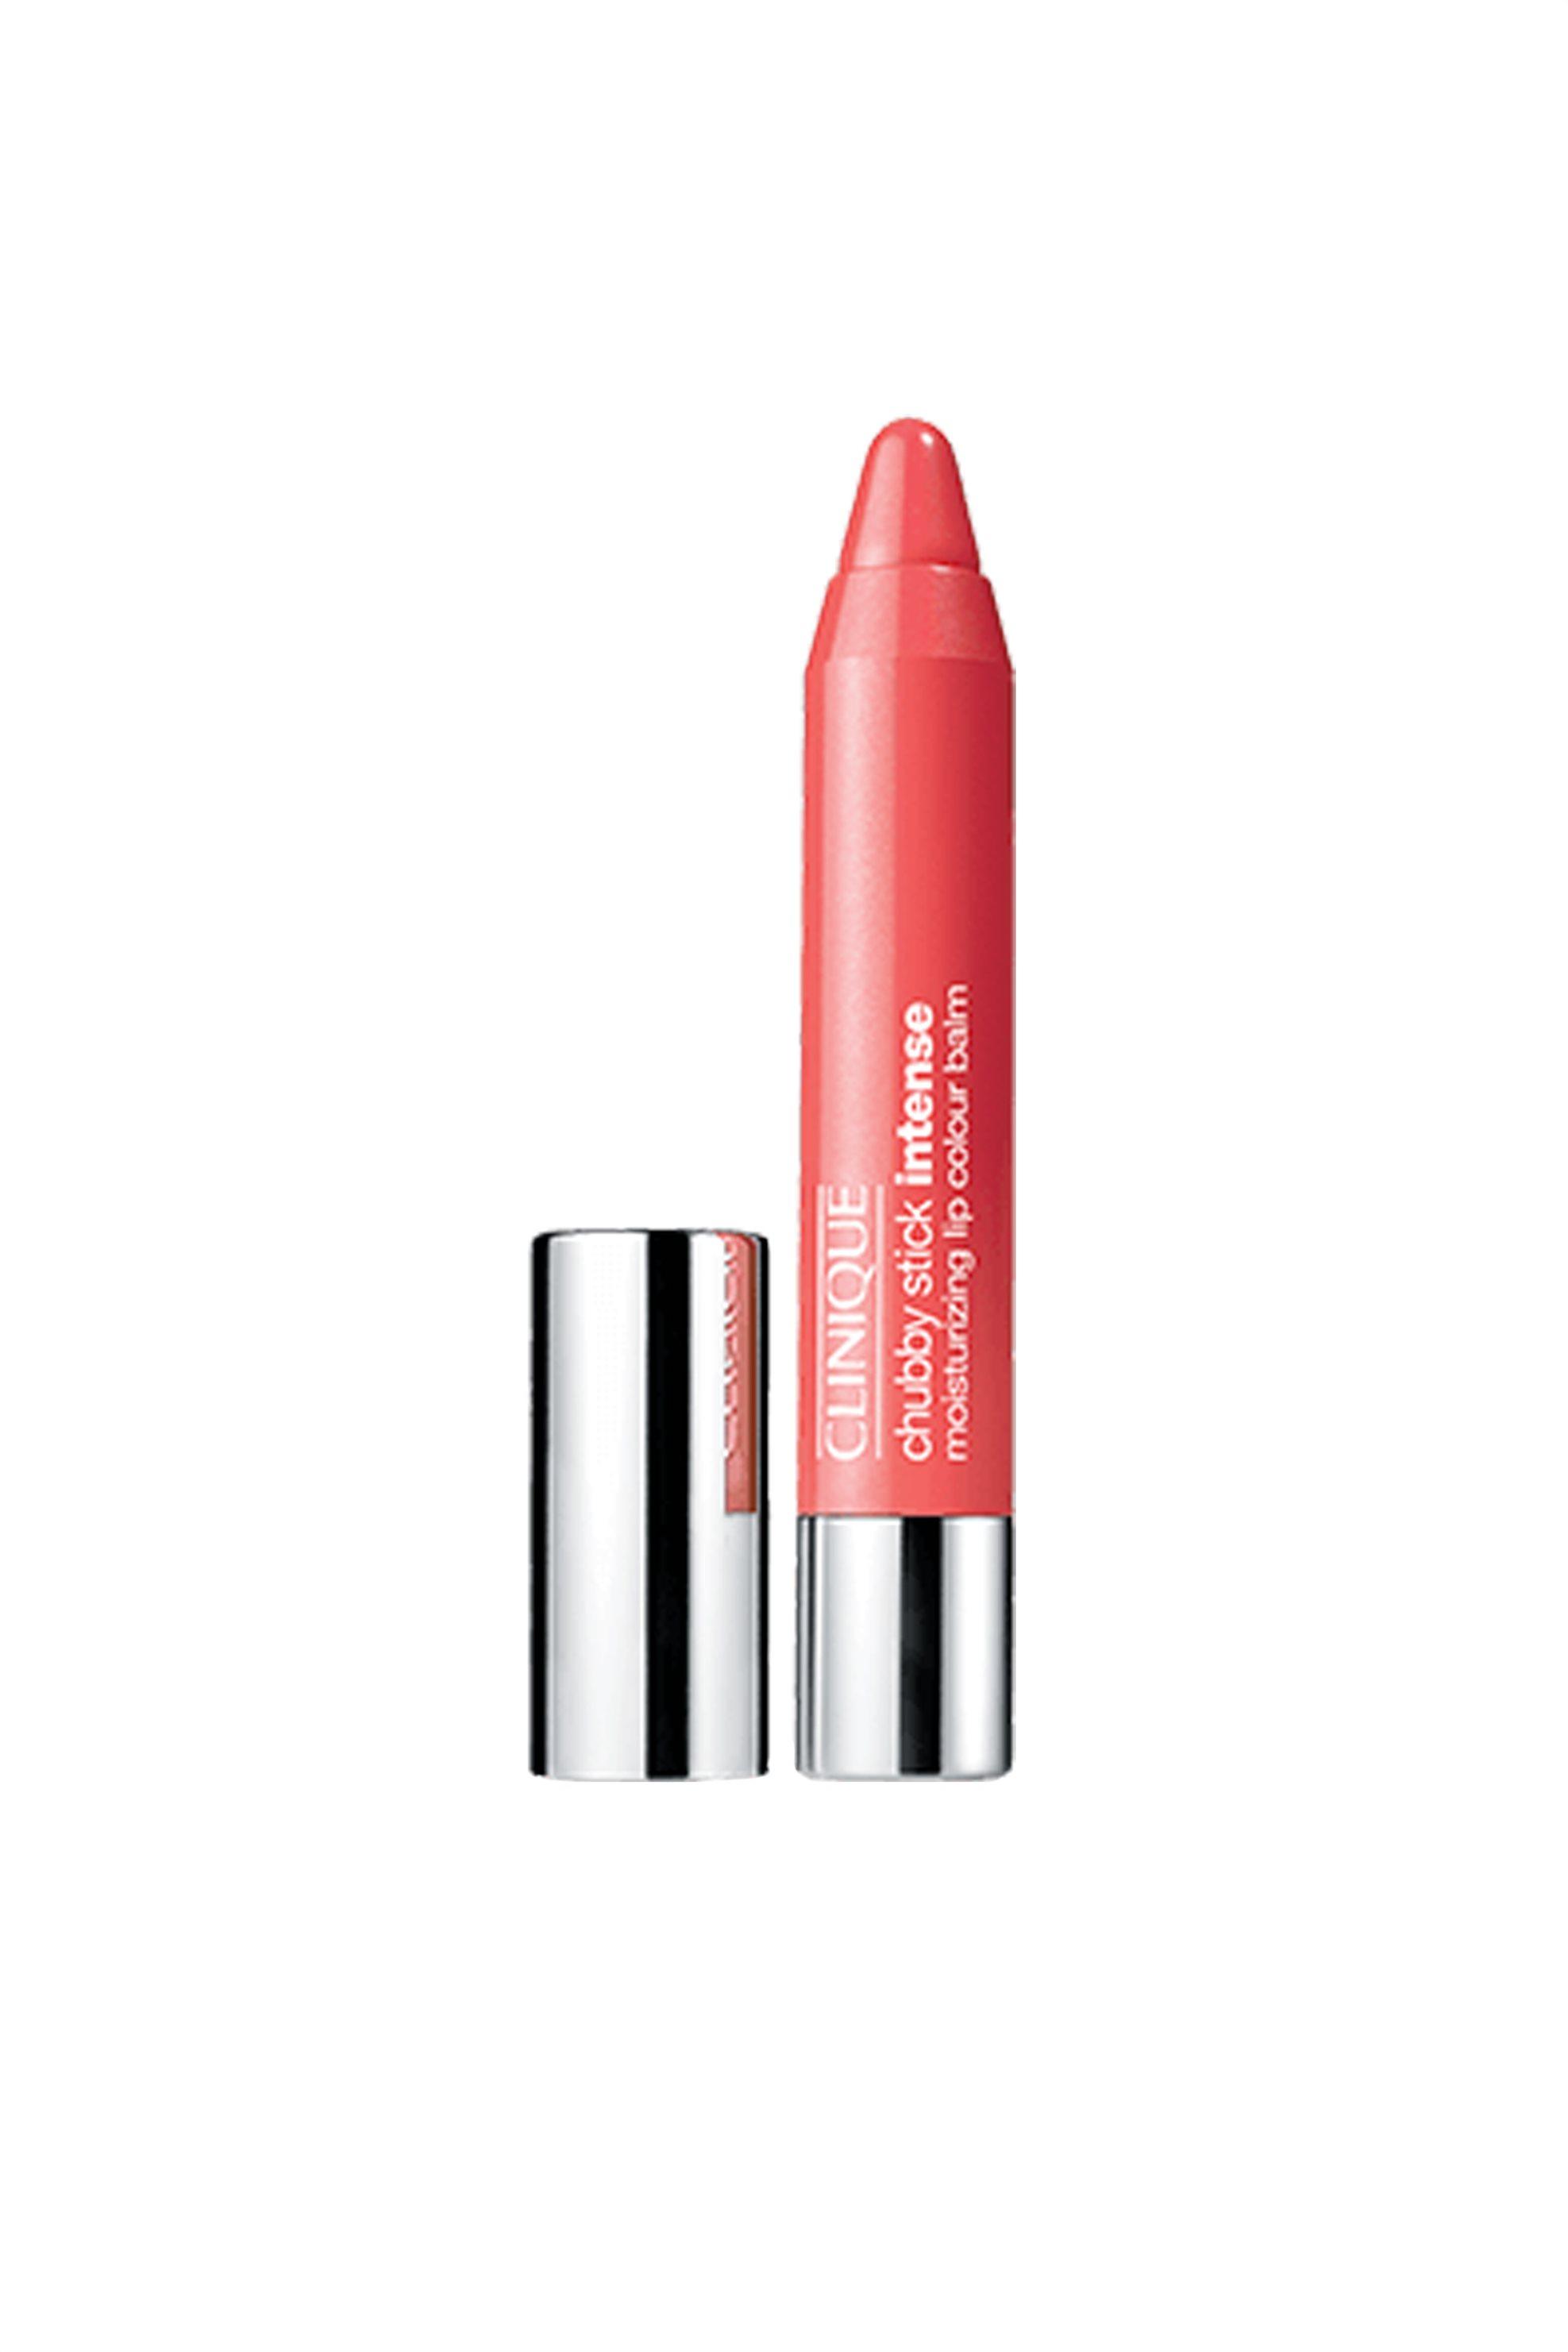 Clinique Chubby Stick Intense™ Moisturizing Lip Colour Balm 04 Heftiest Hibiscus ομορφια   καλλυντικα επιλεκτικησ   μακιγιάζ   χείλη   lip gloss   balms